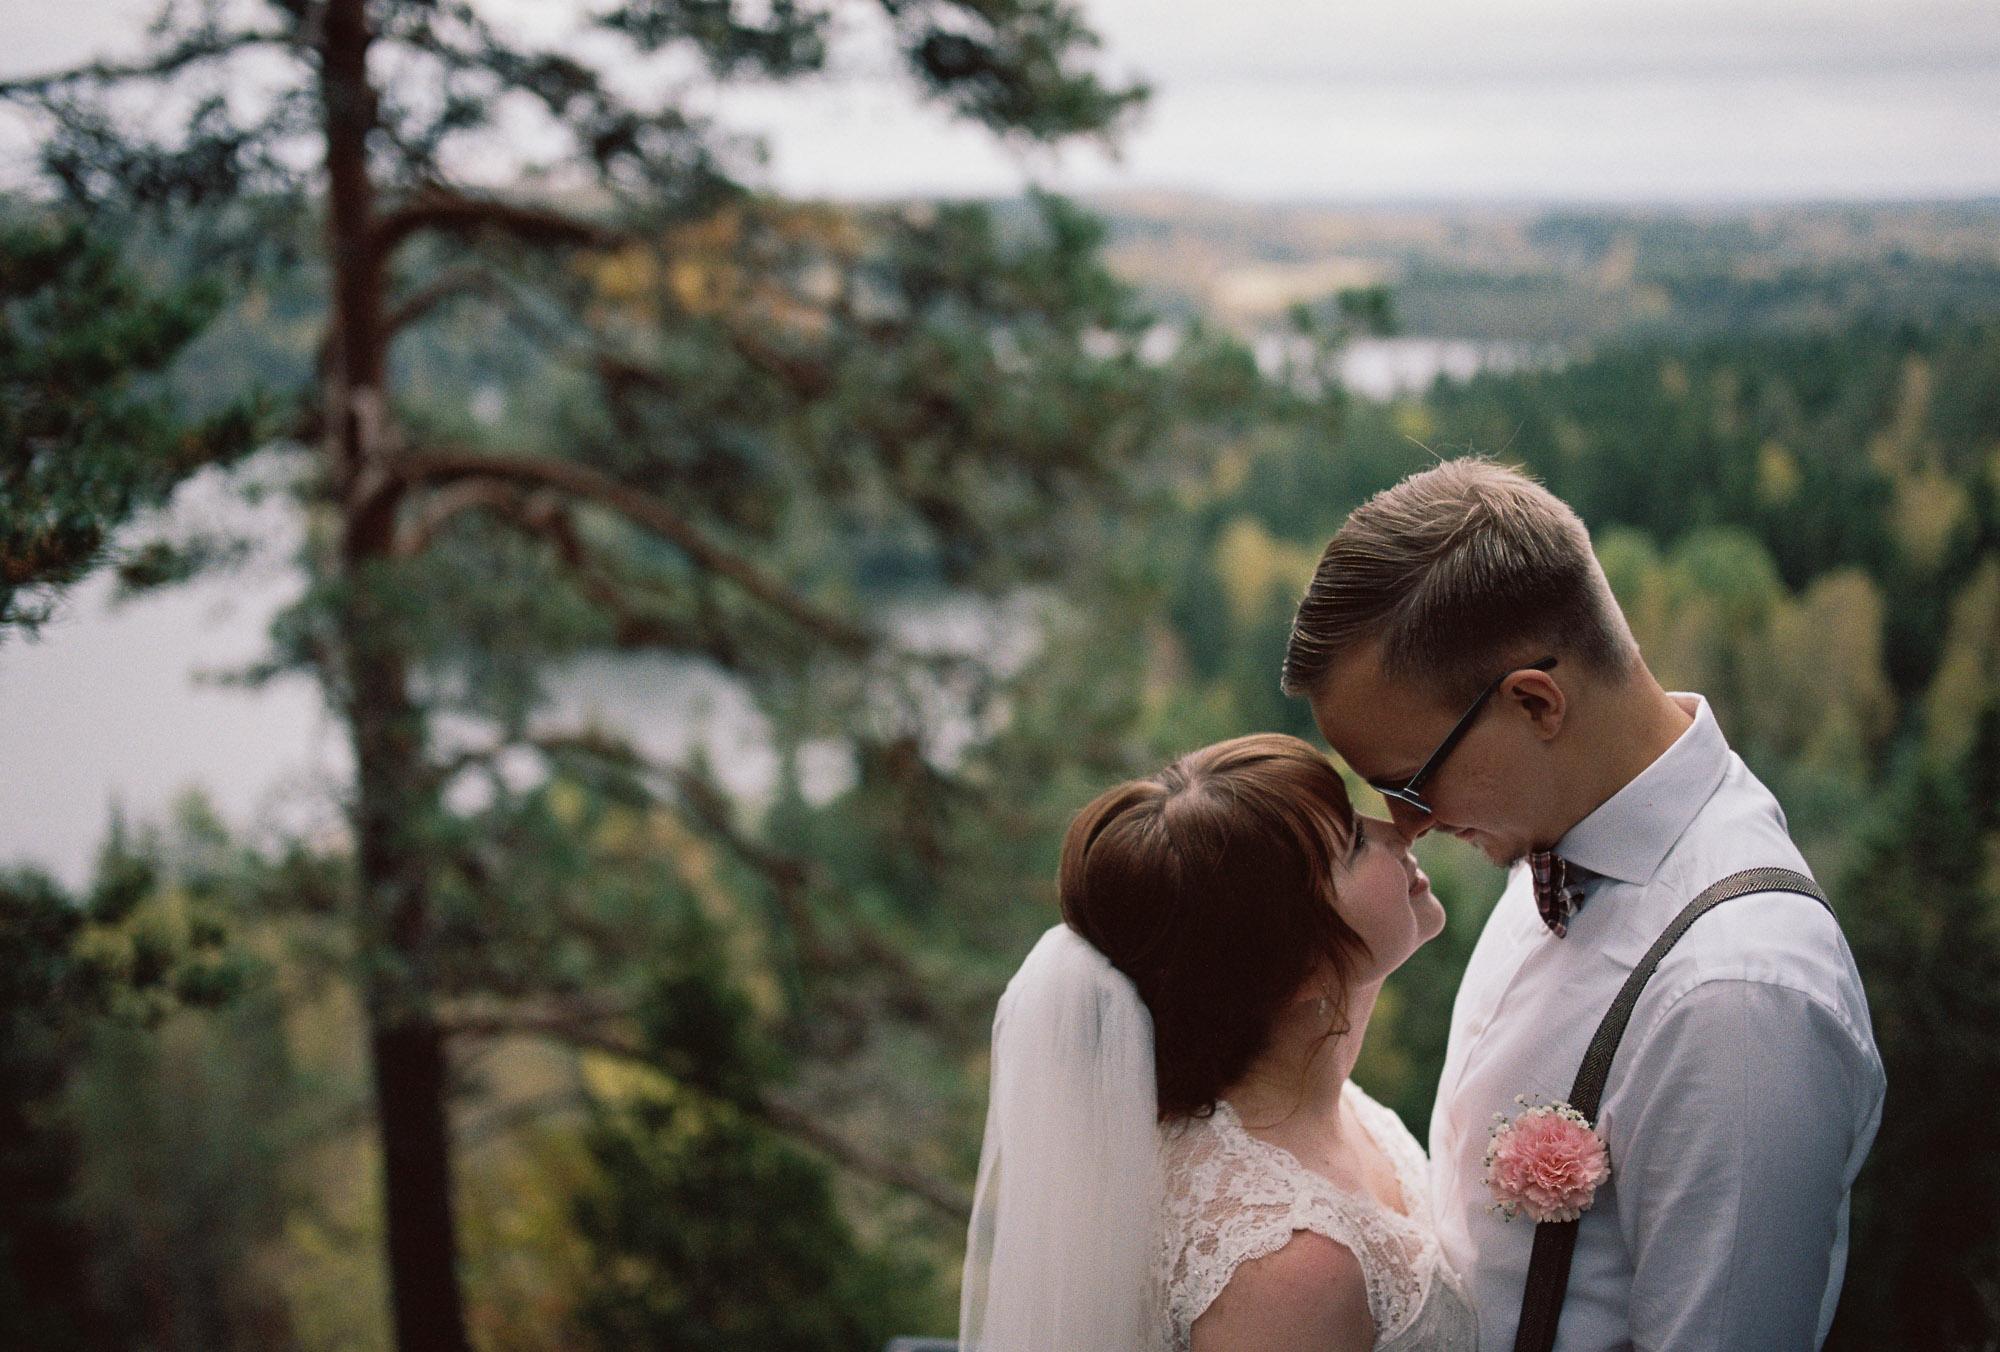 jere-satamo-analog-film-wedding-photographer-finland-126.jpg